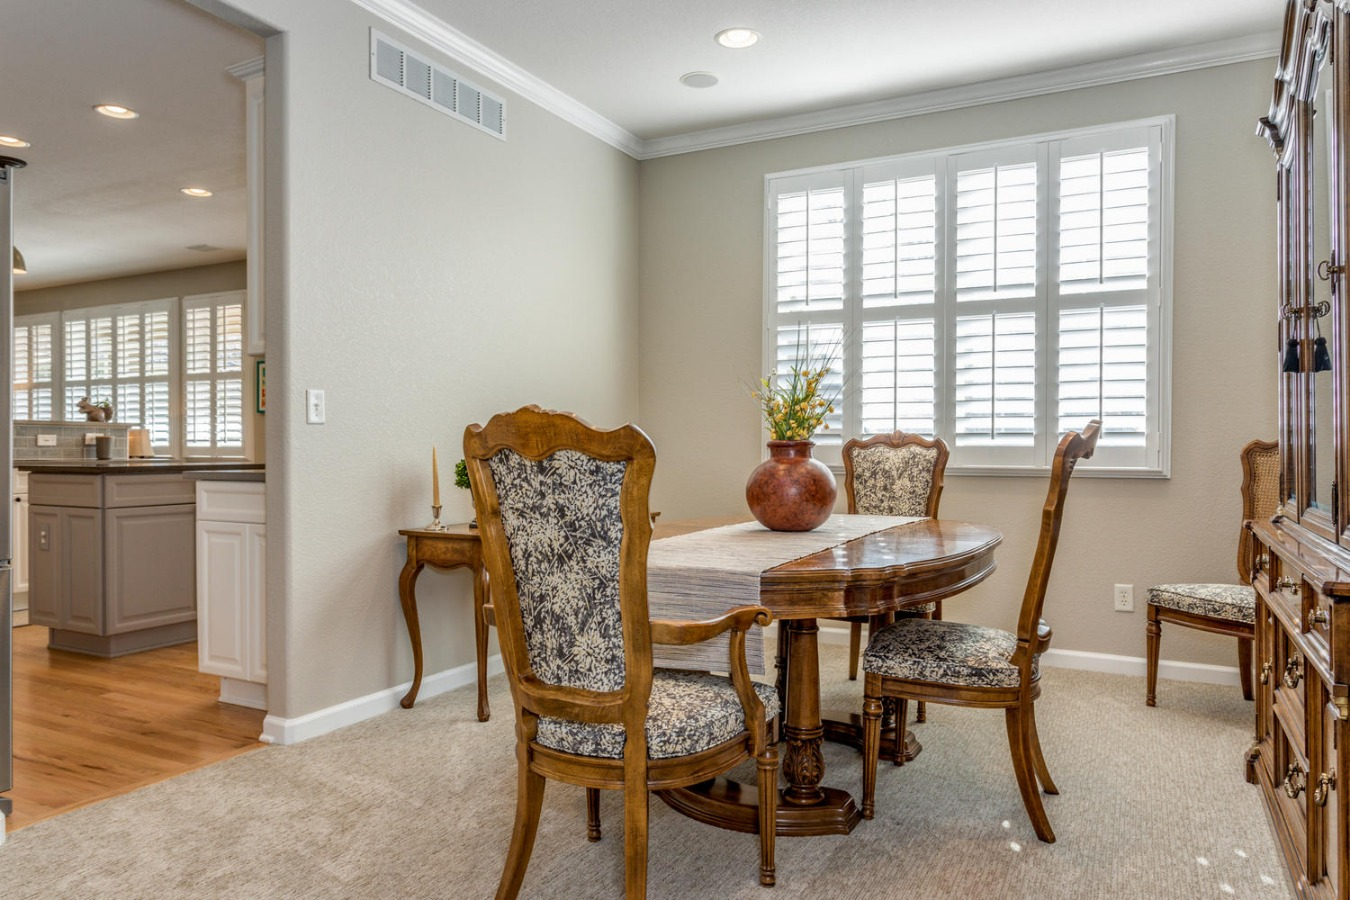 Crown Molding & Built-in Speakers in Dining Room